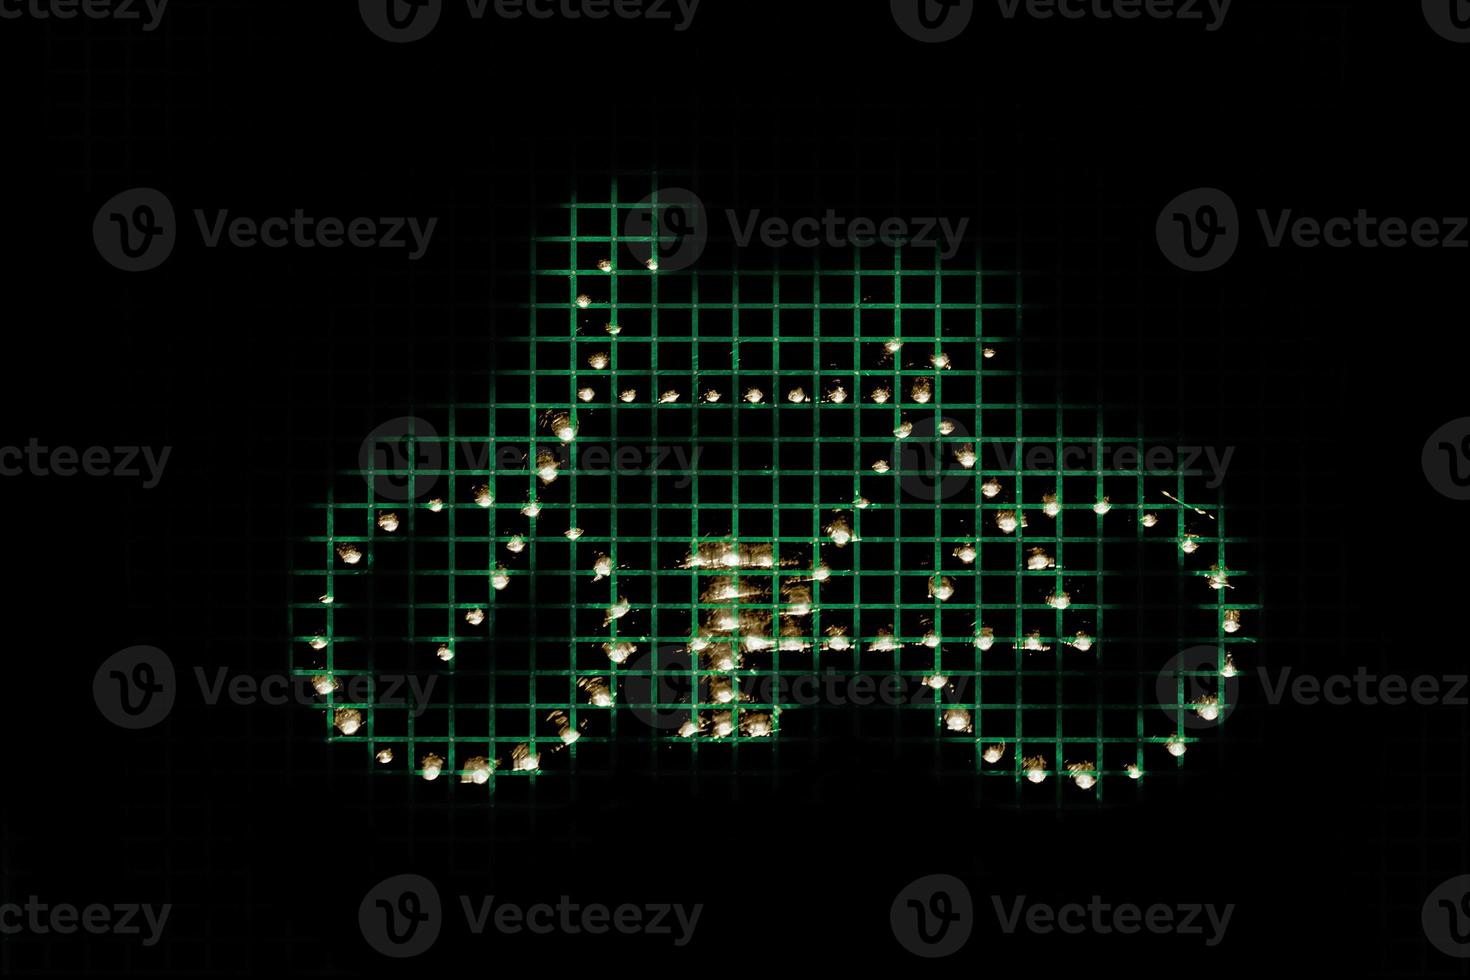 grafisch symboolschema met fiets - bicicleta simbolo foto